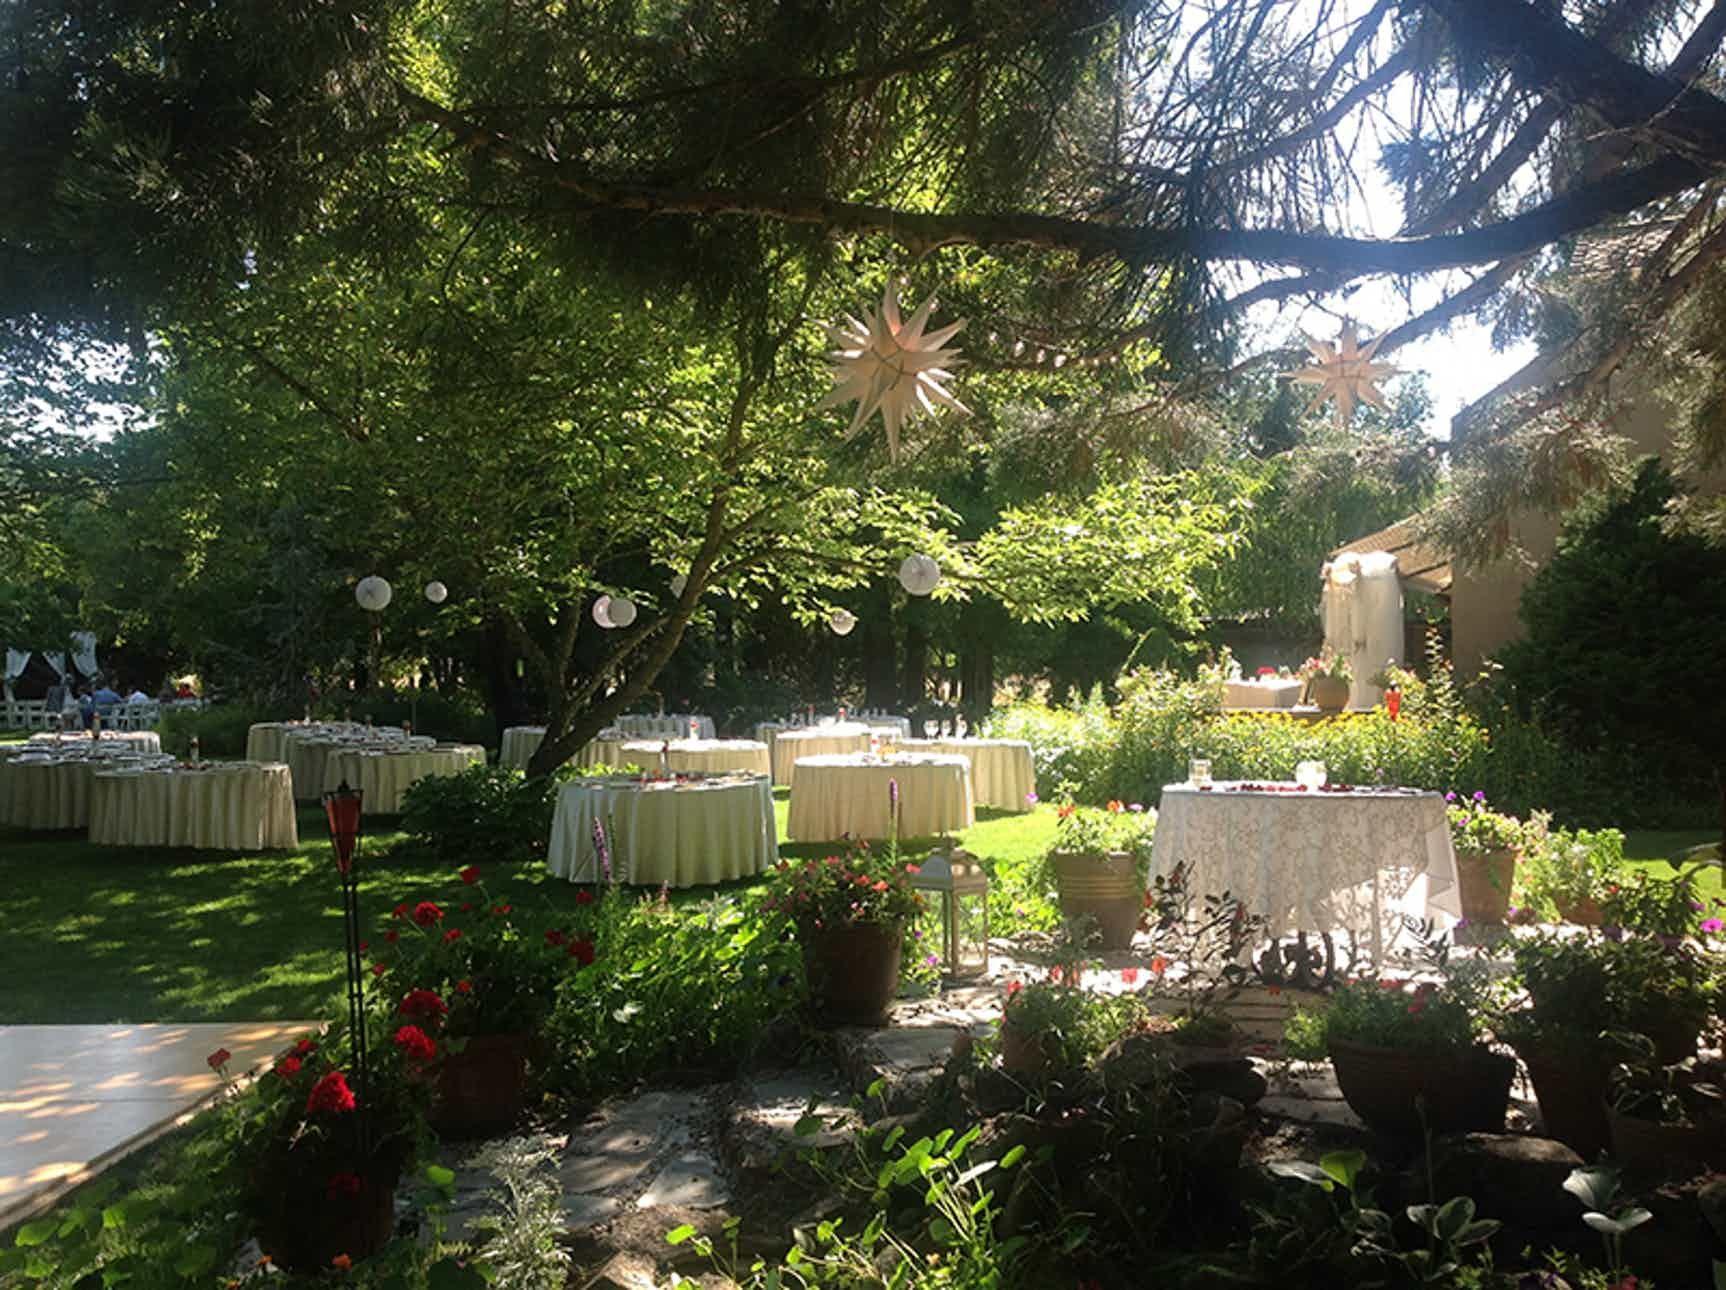 Wisteria Gardens Weddings Southern Oregon Medford Wedding Venue Wedding Venues Oregon Wisteria Garden Wedding Venues